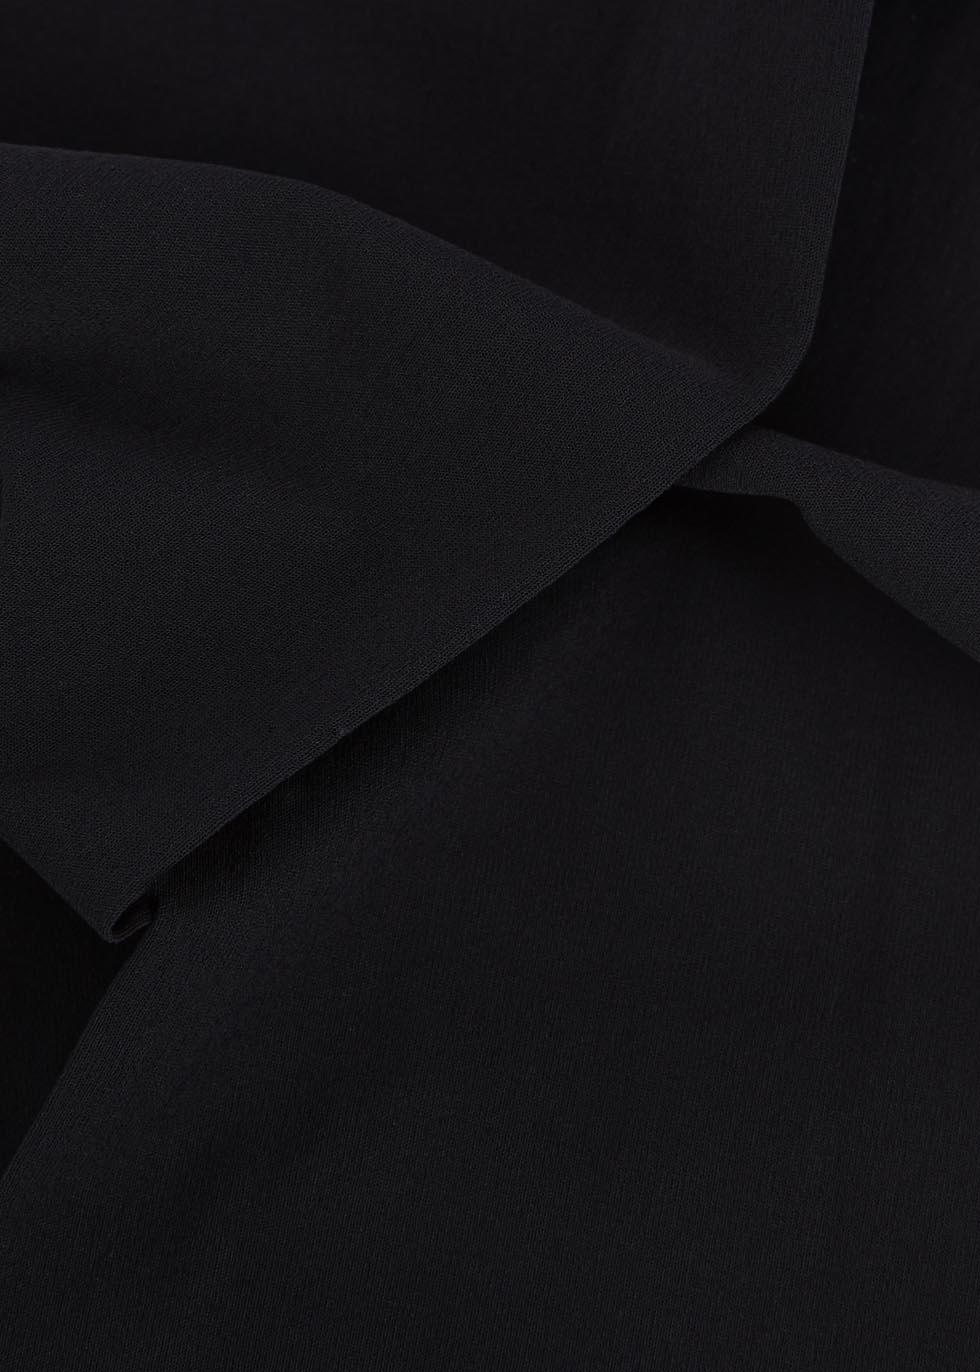 Individual black control-top 10 denier tights - Wolford